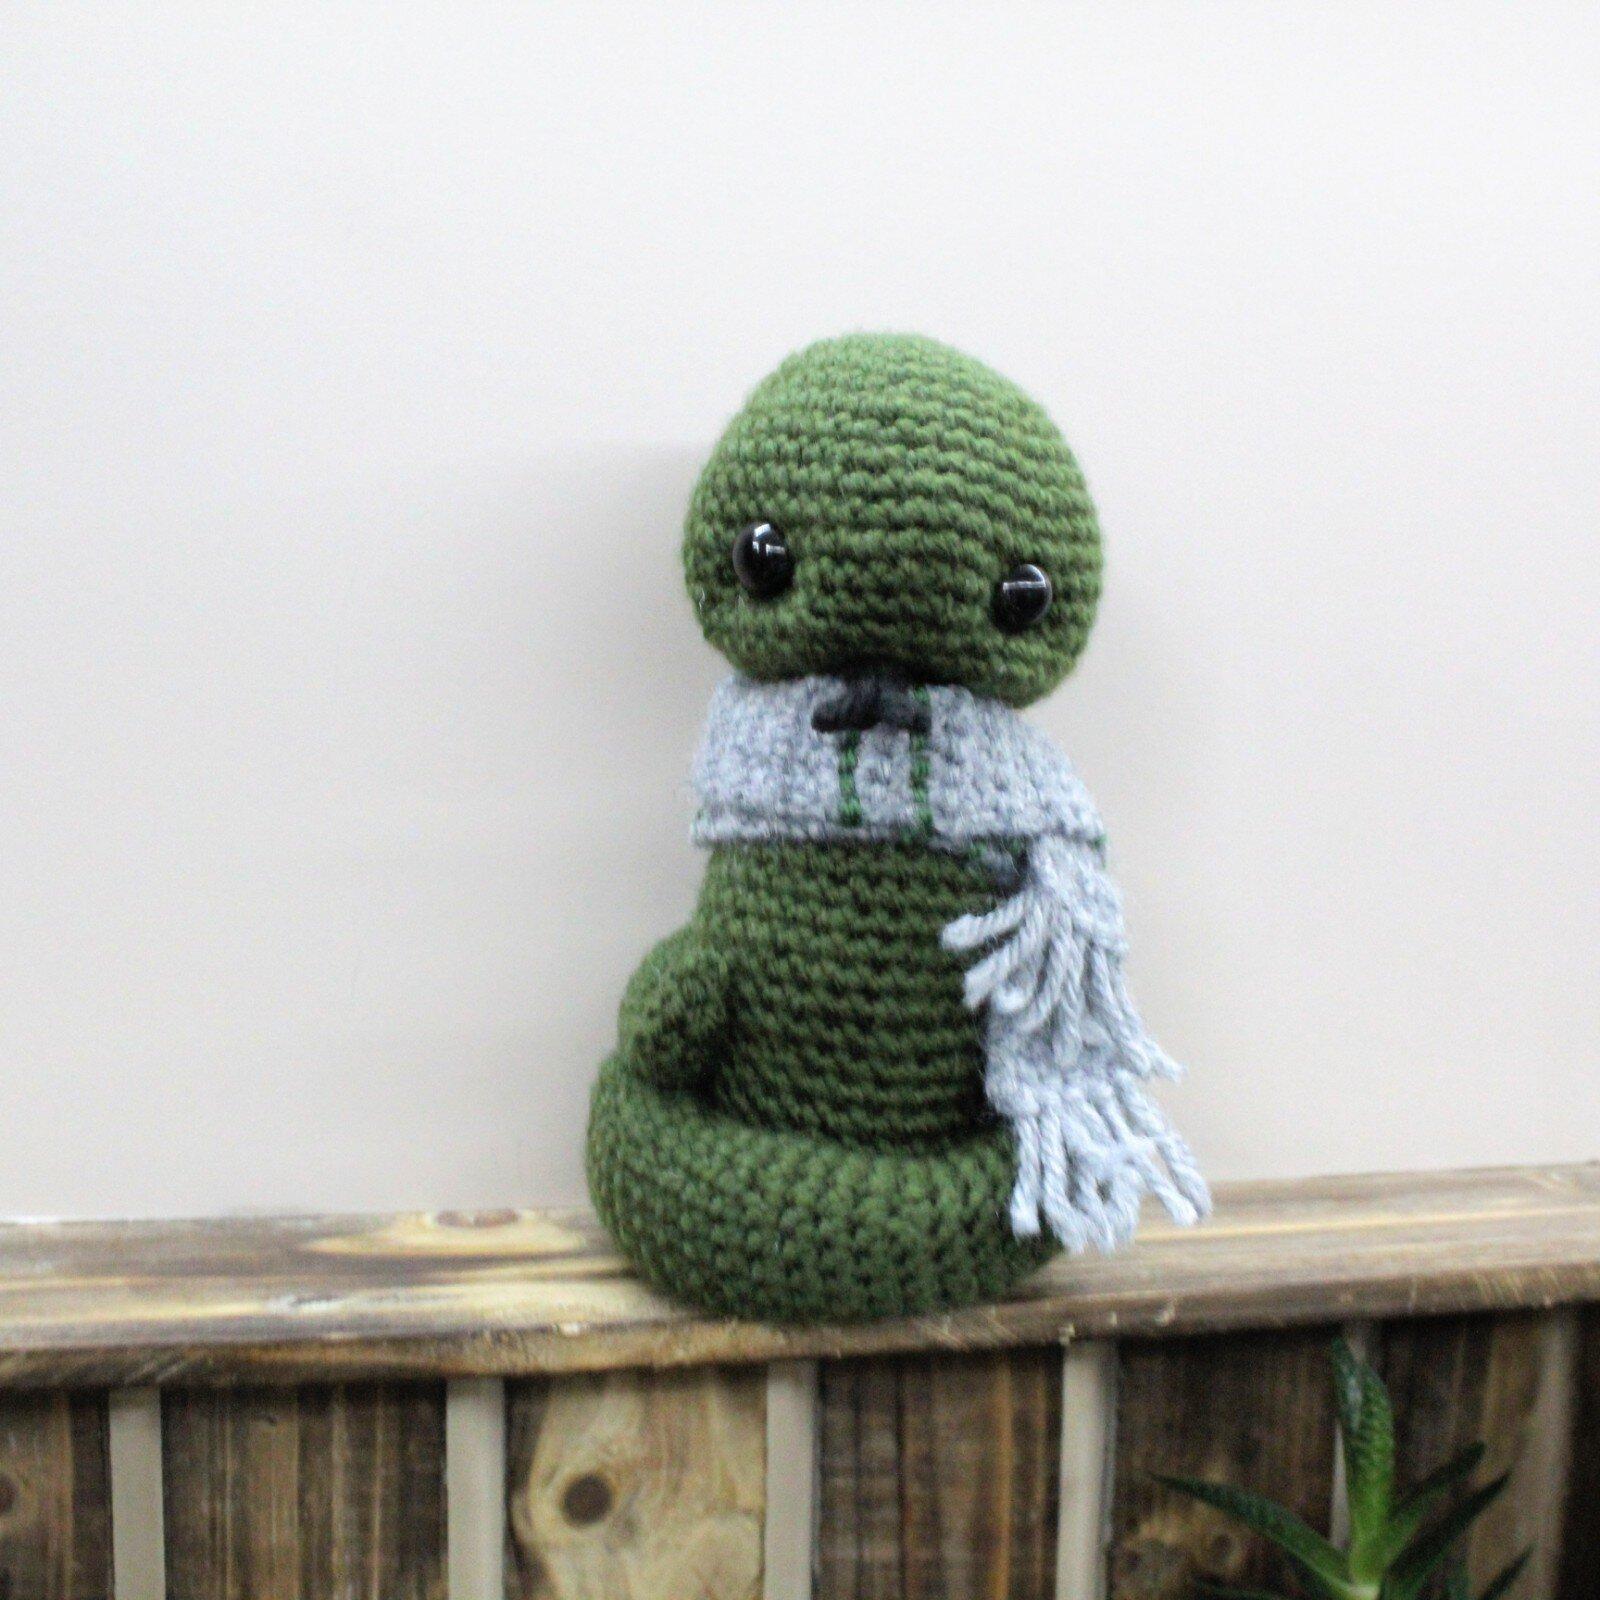 Crochet Rainbow Snake, Free crochet Pattern - GoldenLucyCrafts | 1000x1000